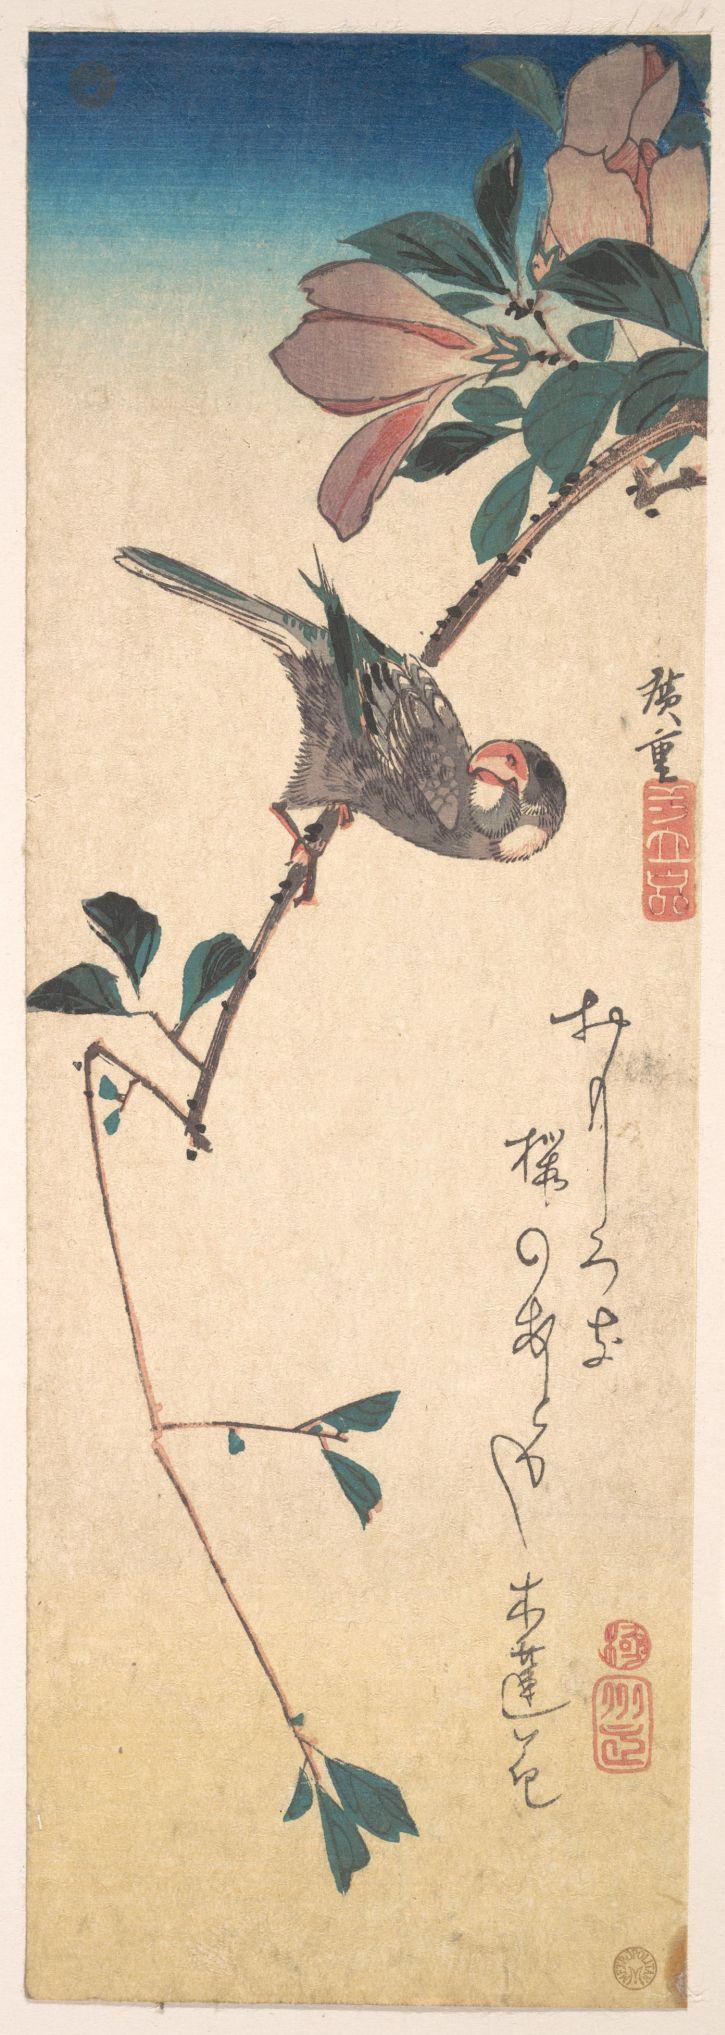 Hiroshige, Purple Magnolia and Hornbill, 1830